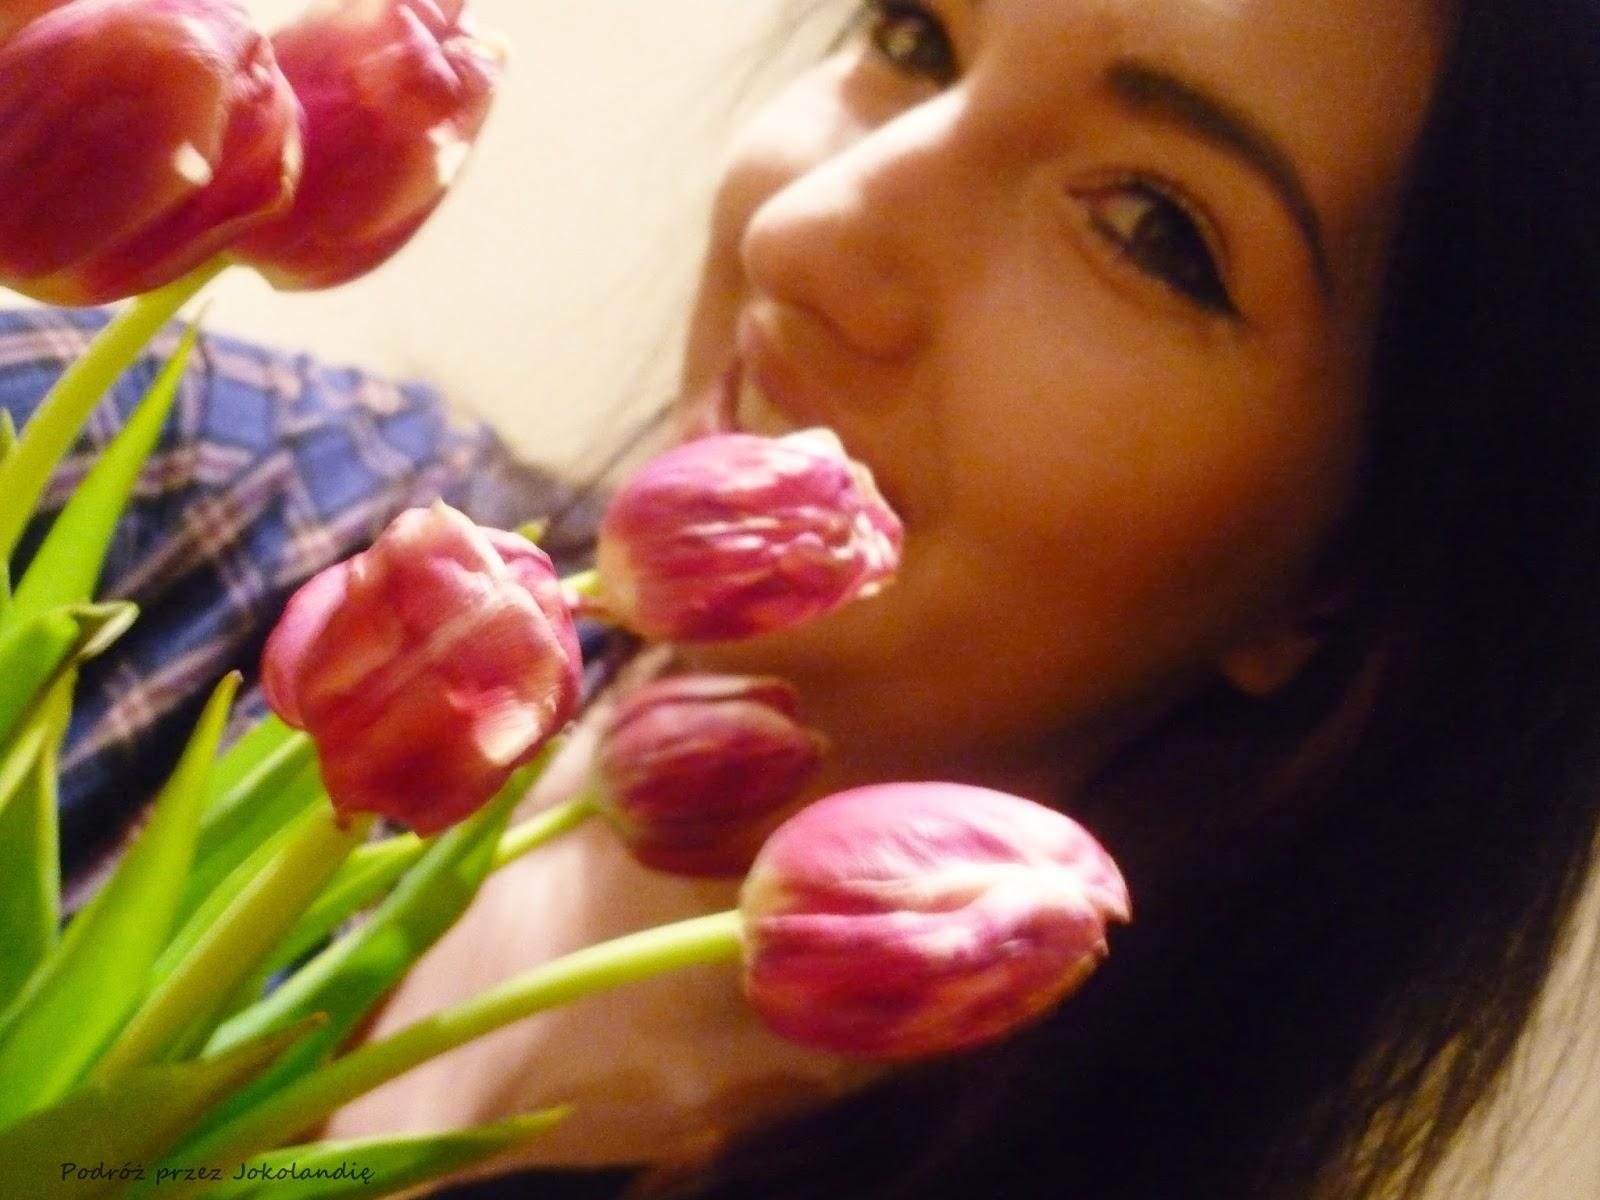 http://arcy-beauty.blogspot.com/2014/03/podroz-przez-jokolandie-iv.html